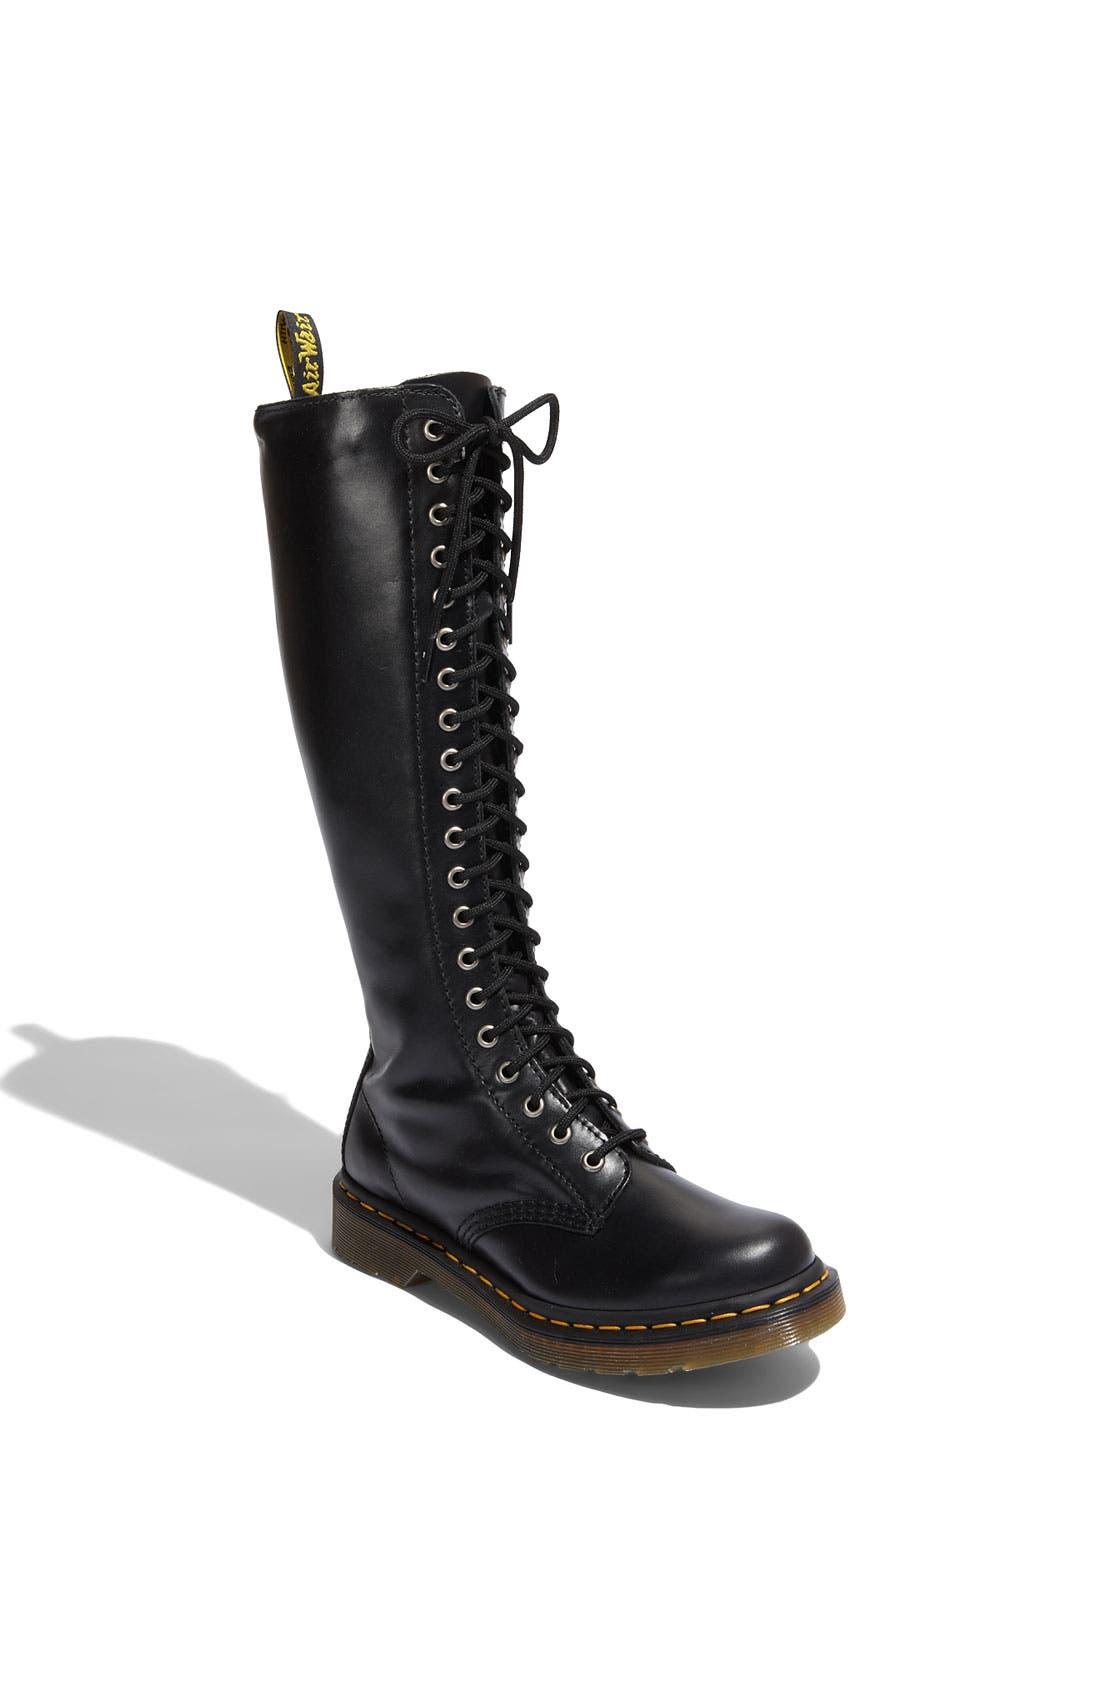 Alternate Image 1 Selected - Dr. Martens '1B60 20 Eye Zip' Boot (Women)